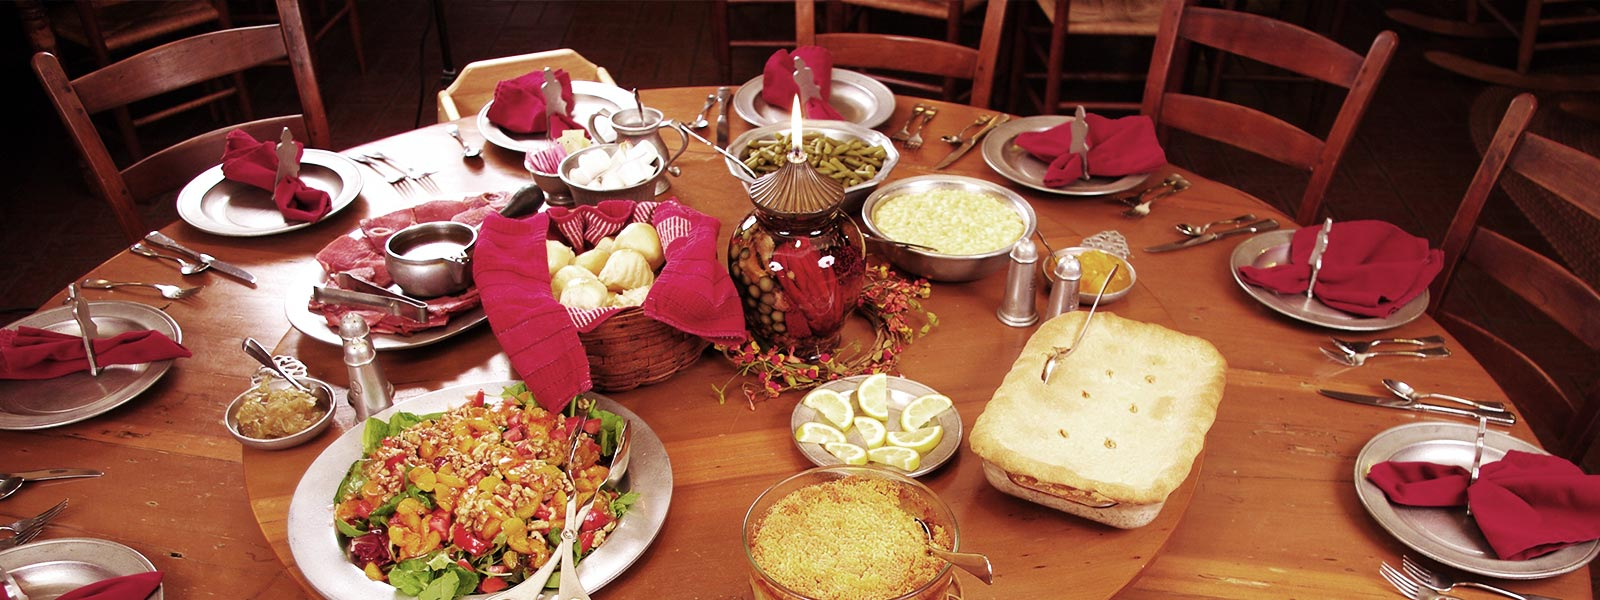 hemlock-inn-asheville-nc-cabin-meal